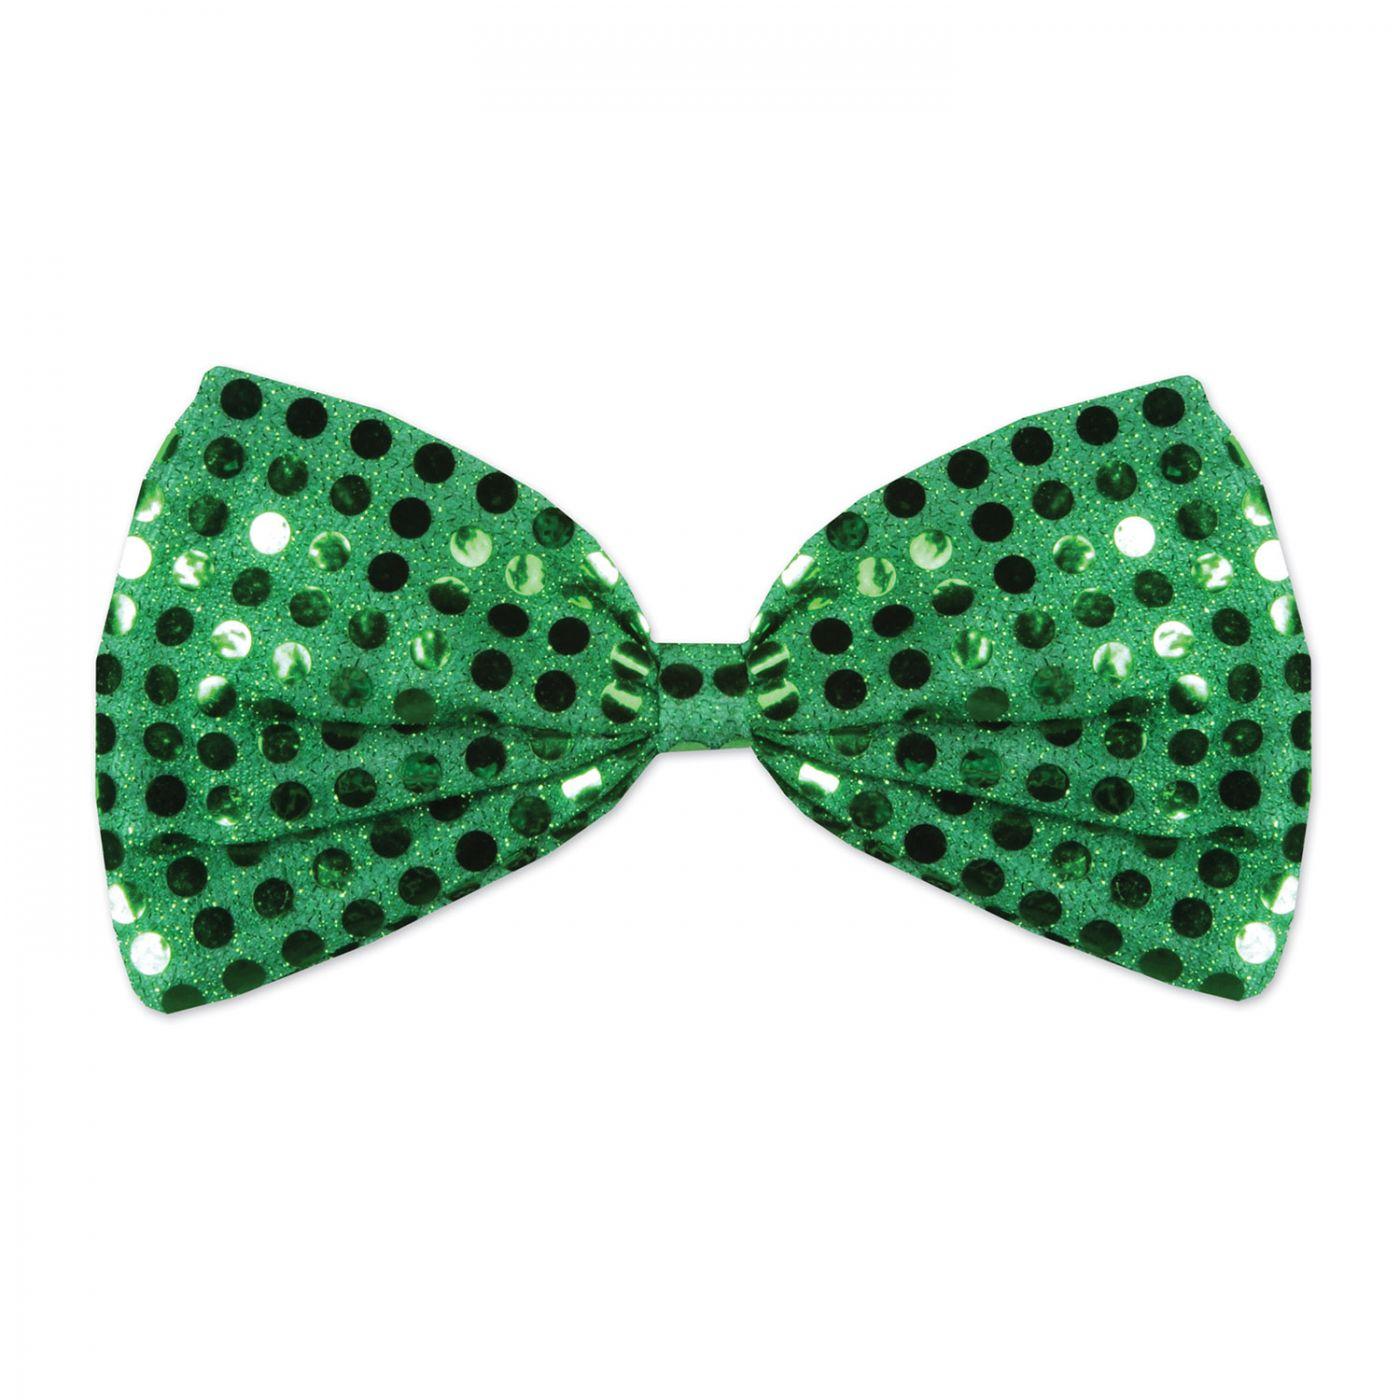 Green Glitz 'N Gleam Bow Tie image